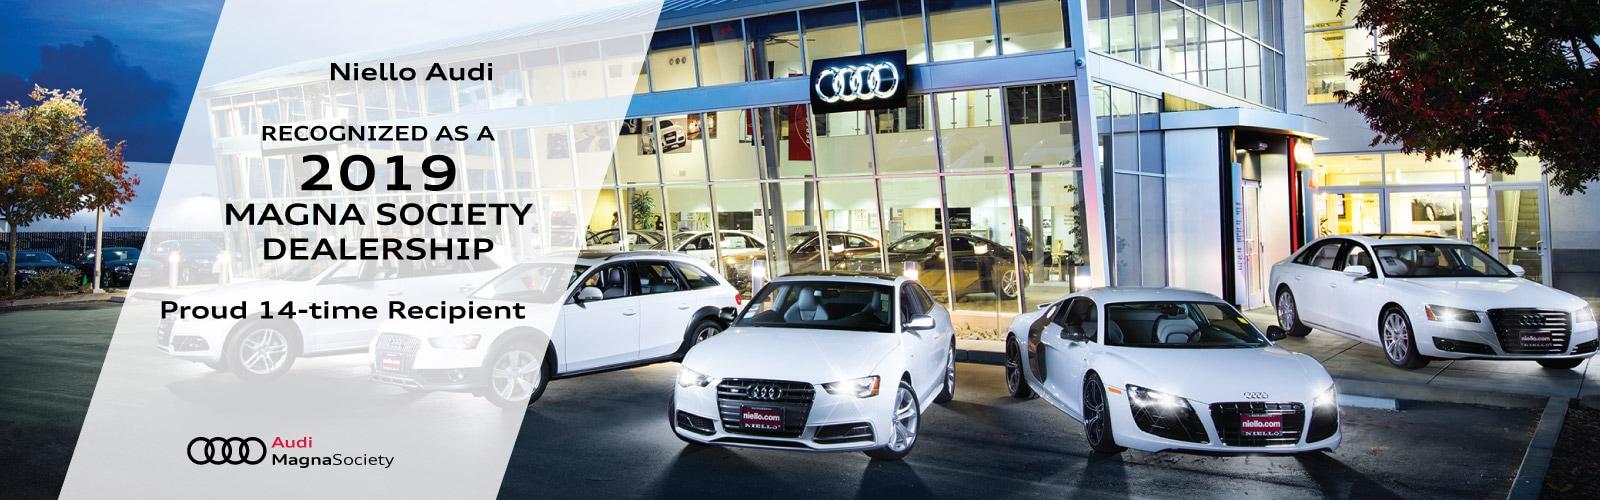 Niello Audi | New Audi Dealership in Sacramento, CA